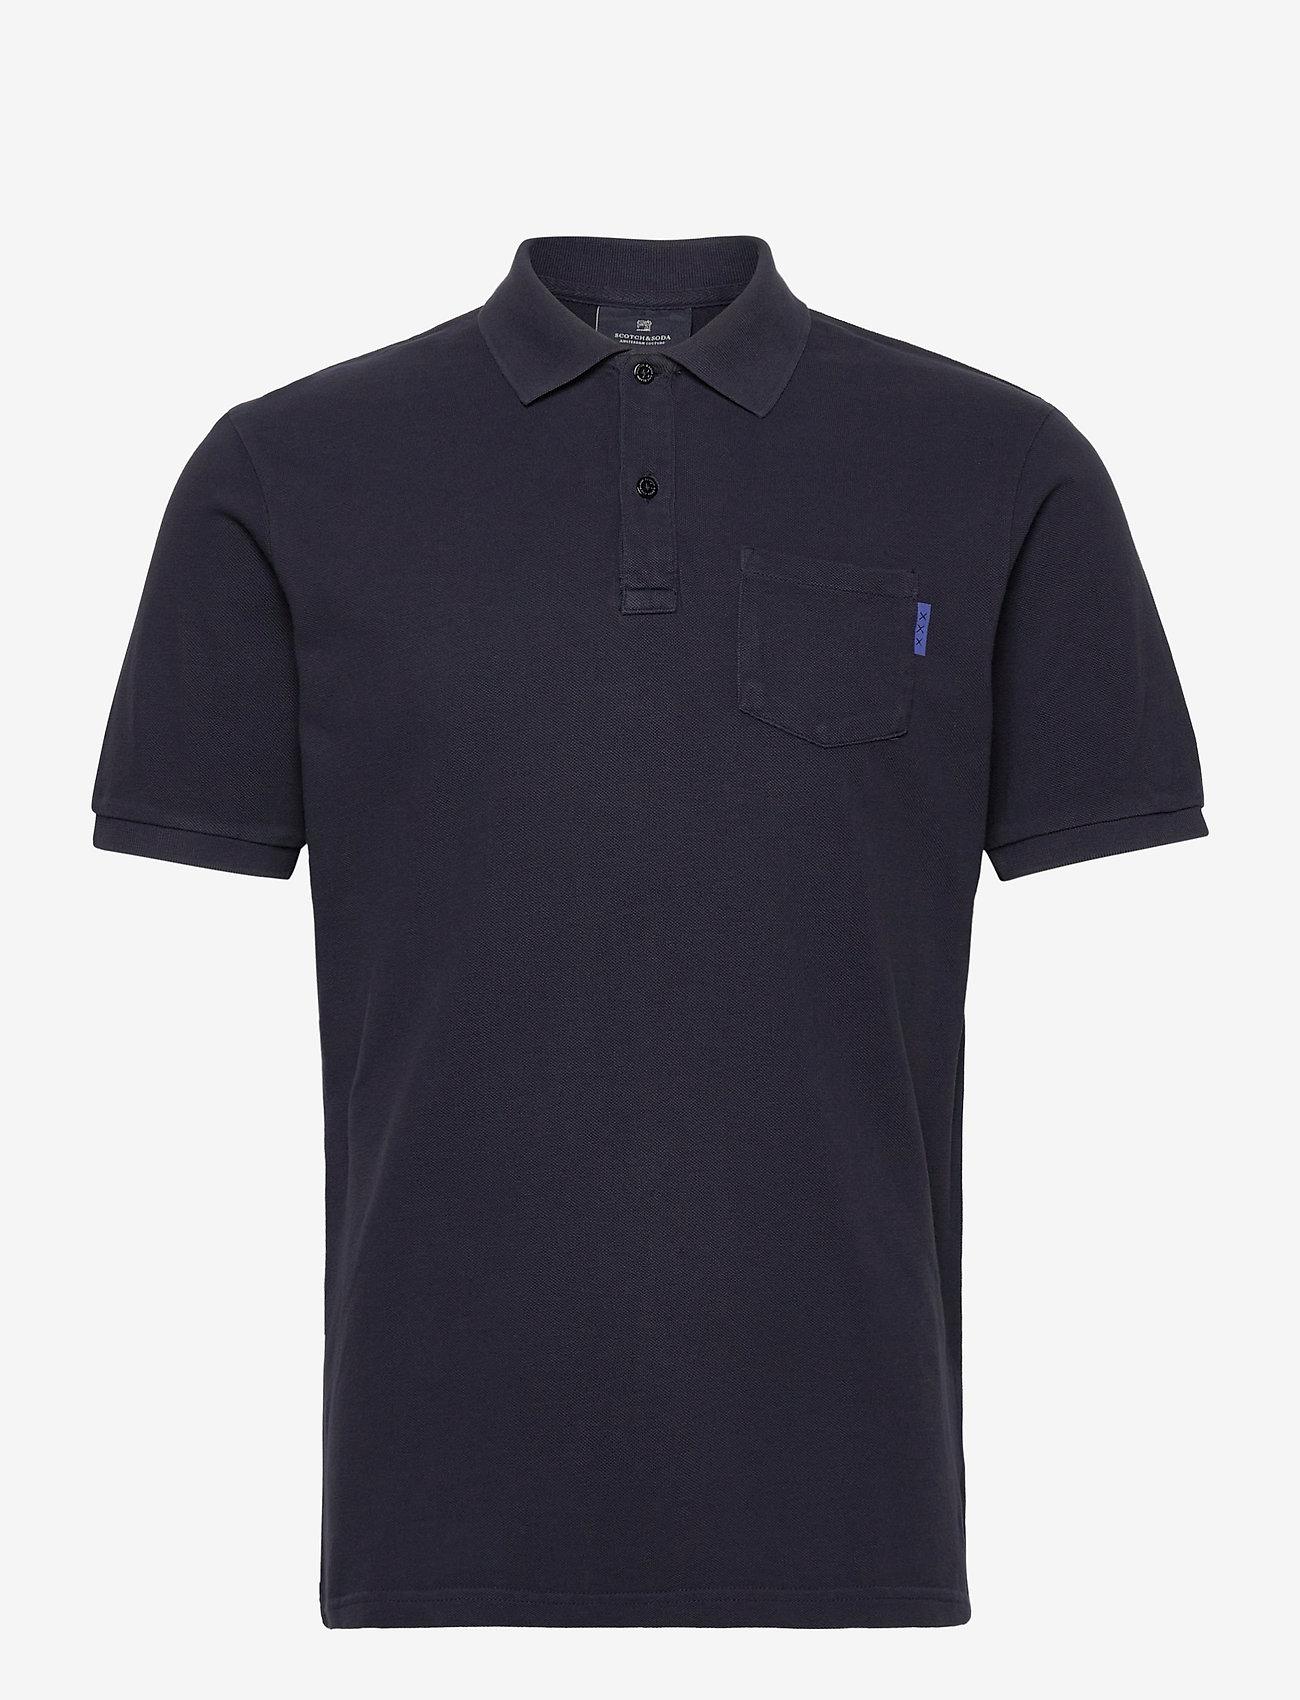 Scotch & Soda - Garment dye polo - short-sleeved polos - night - 0